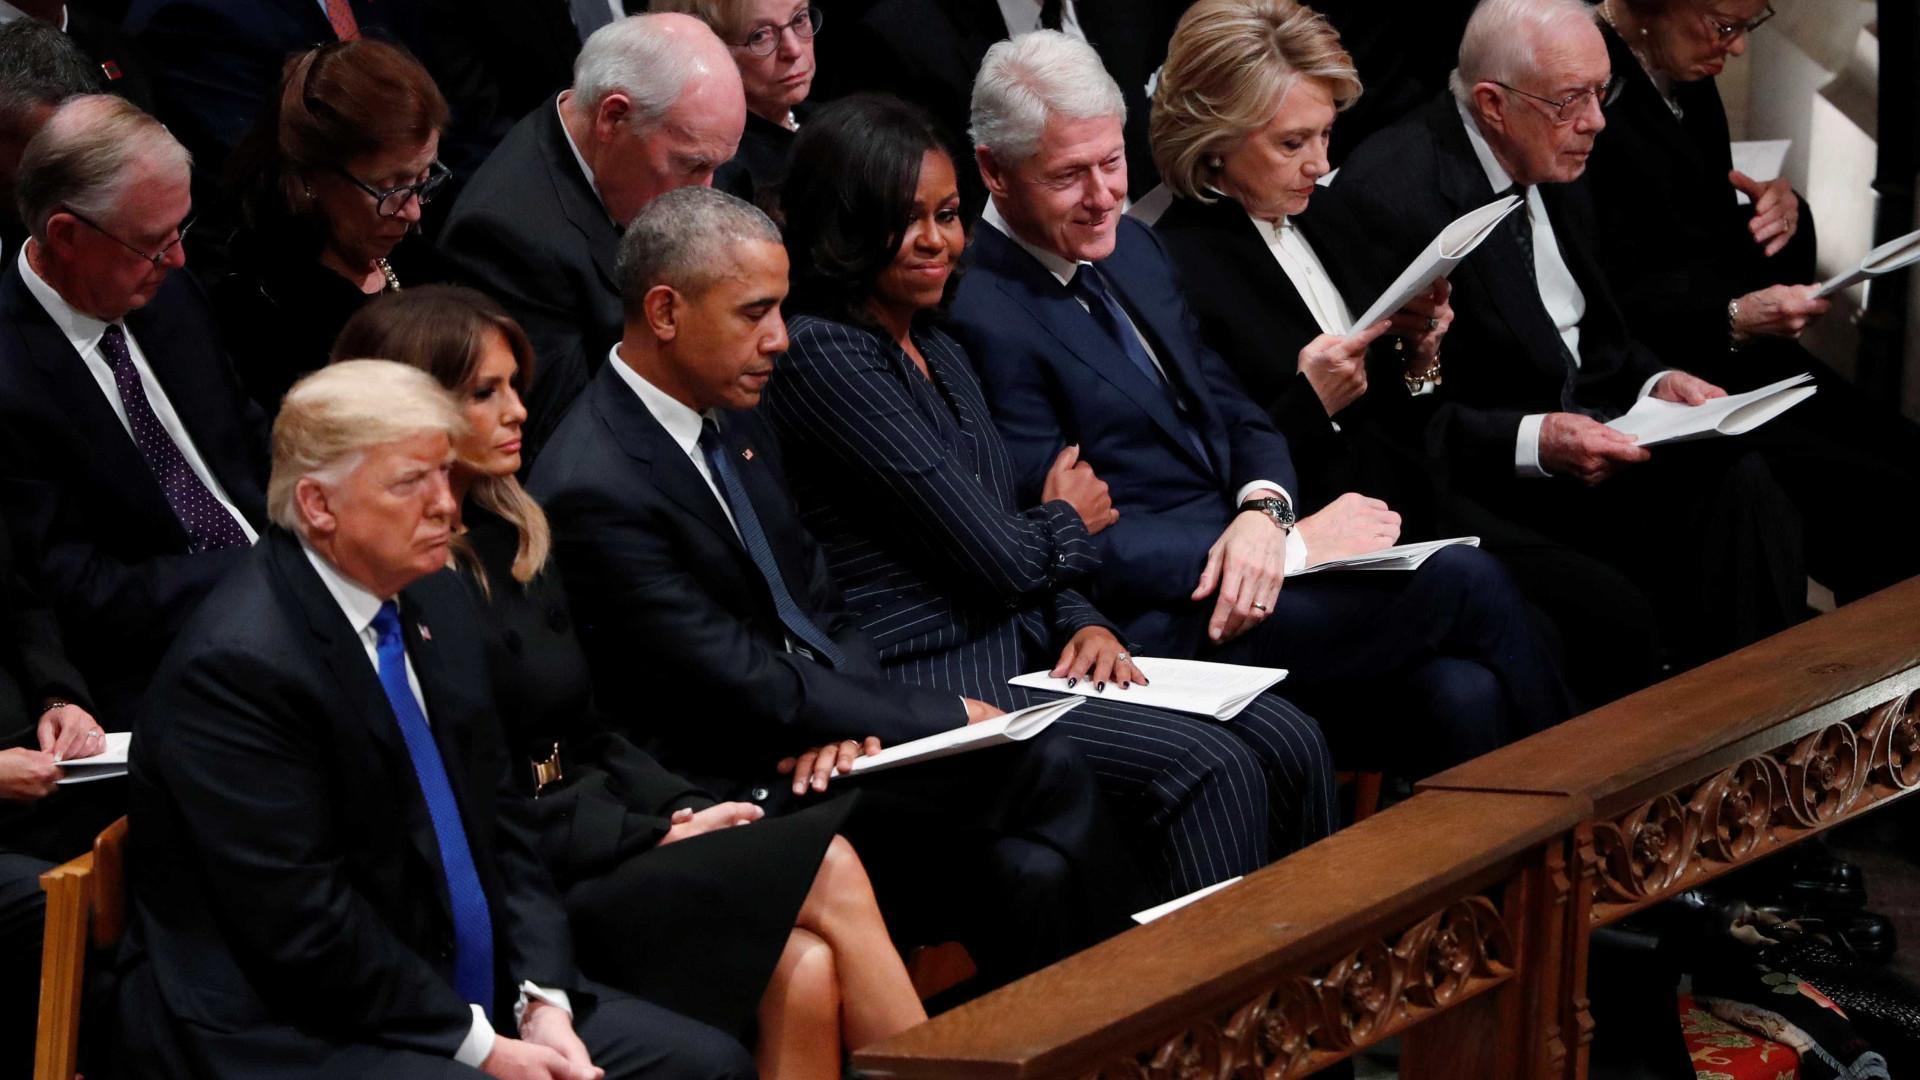 Funeral de George H. W. Bush reúne Trump, Clinton e Obama